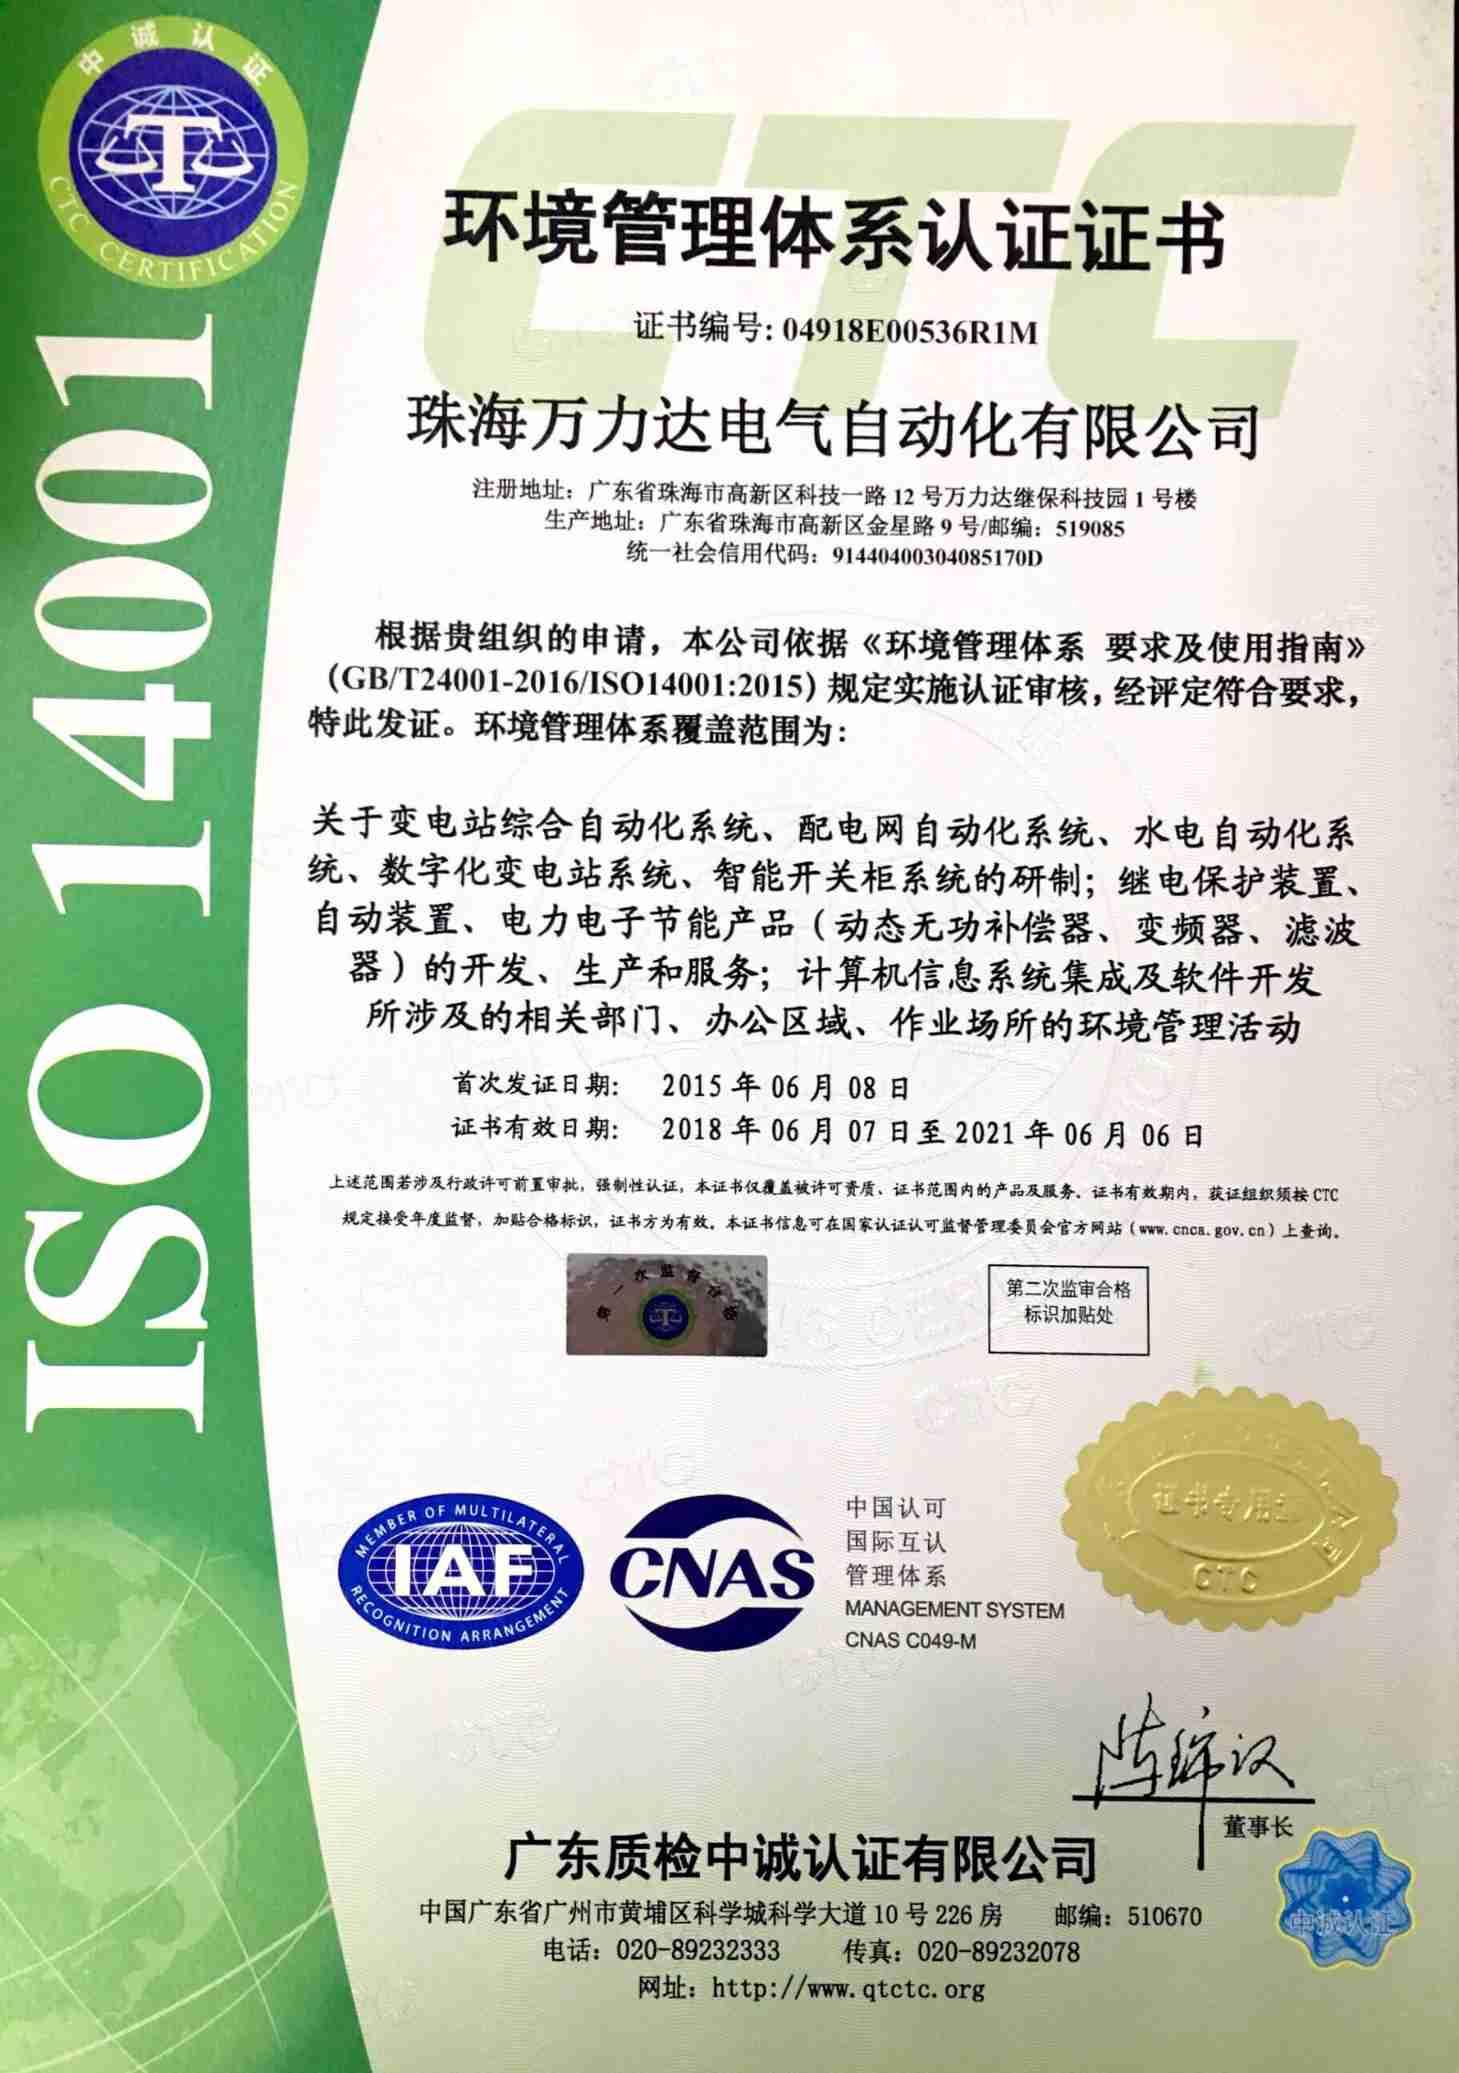 <span>环境管理体系认证</span>